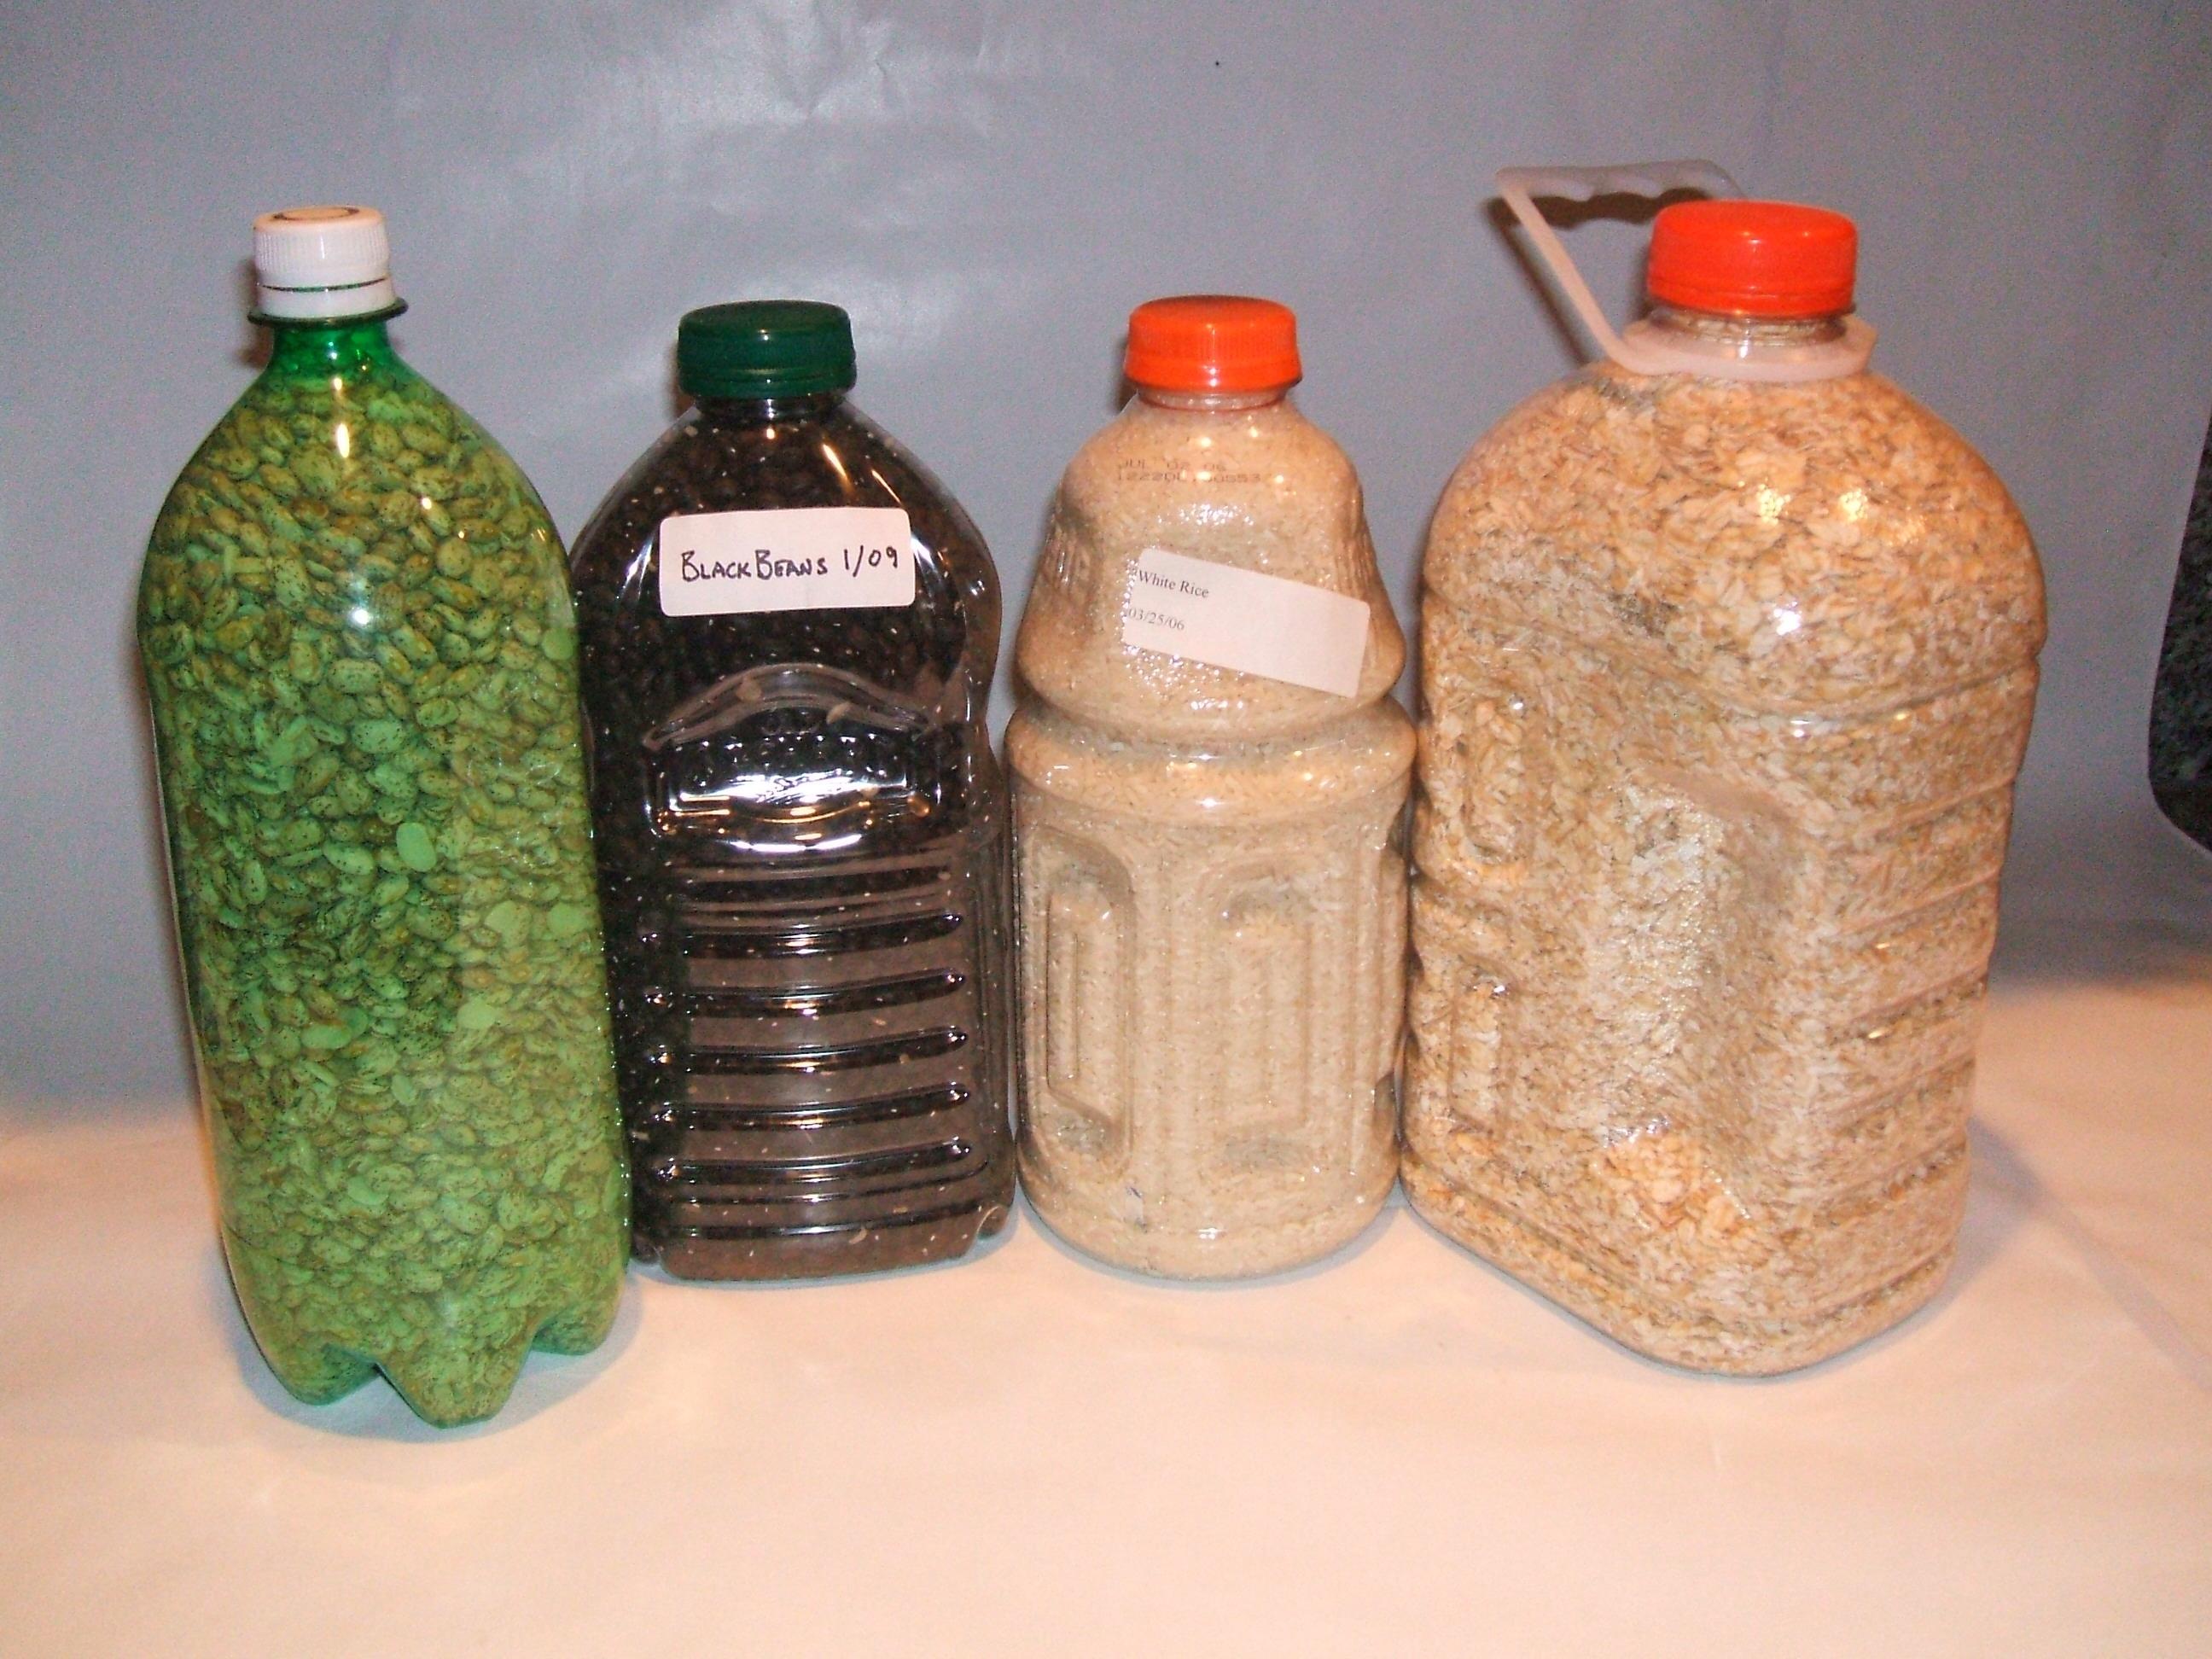 Storing Bulk Dry Foods in PETE Bottles using Oxygen Absorbers